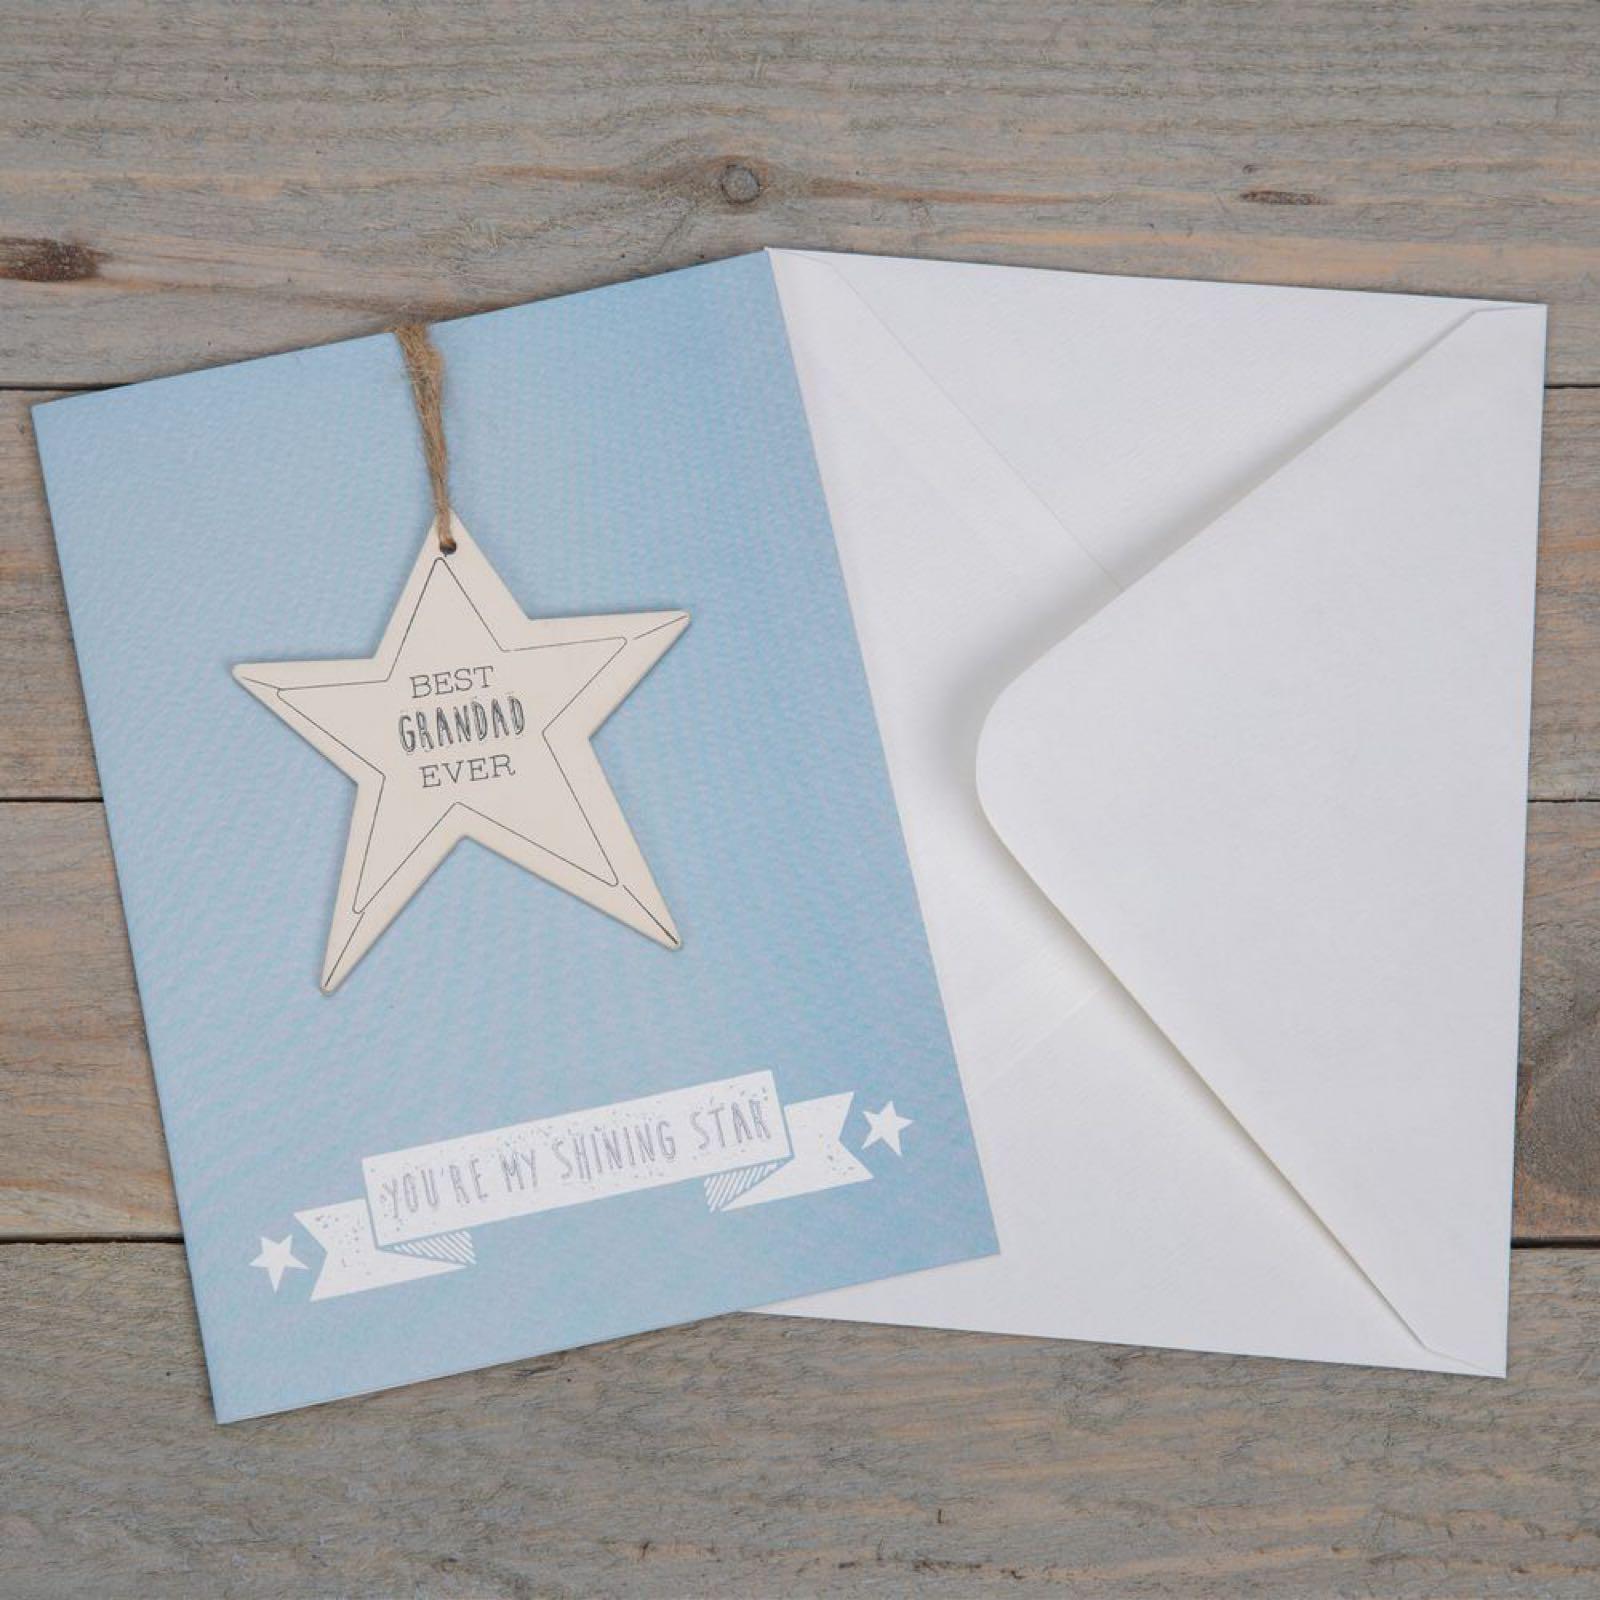 Best Grandad Ever Greeting Card & Plaque